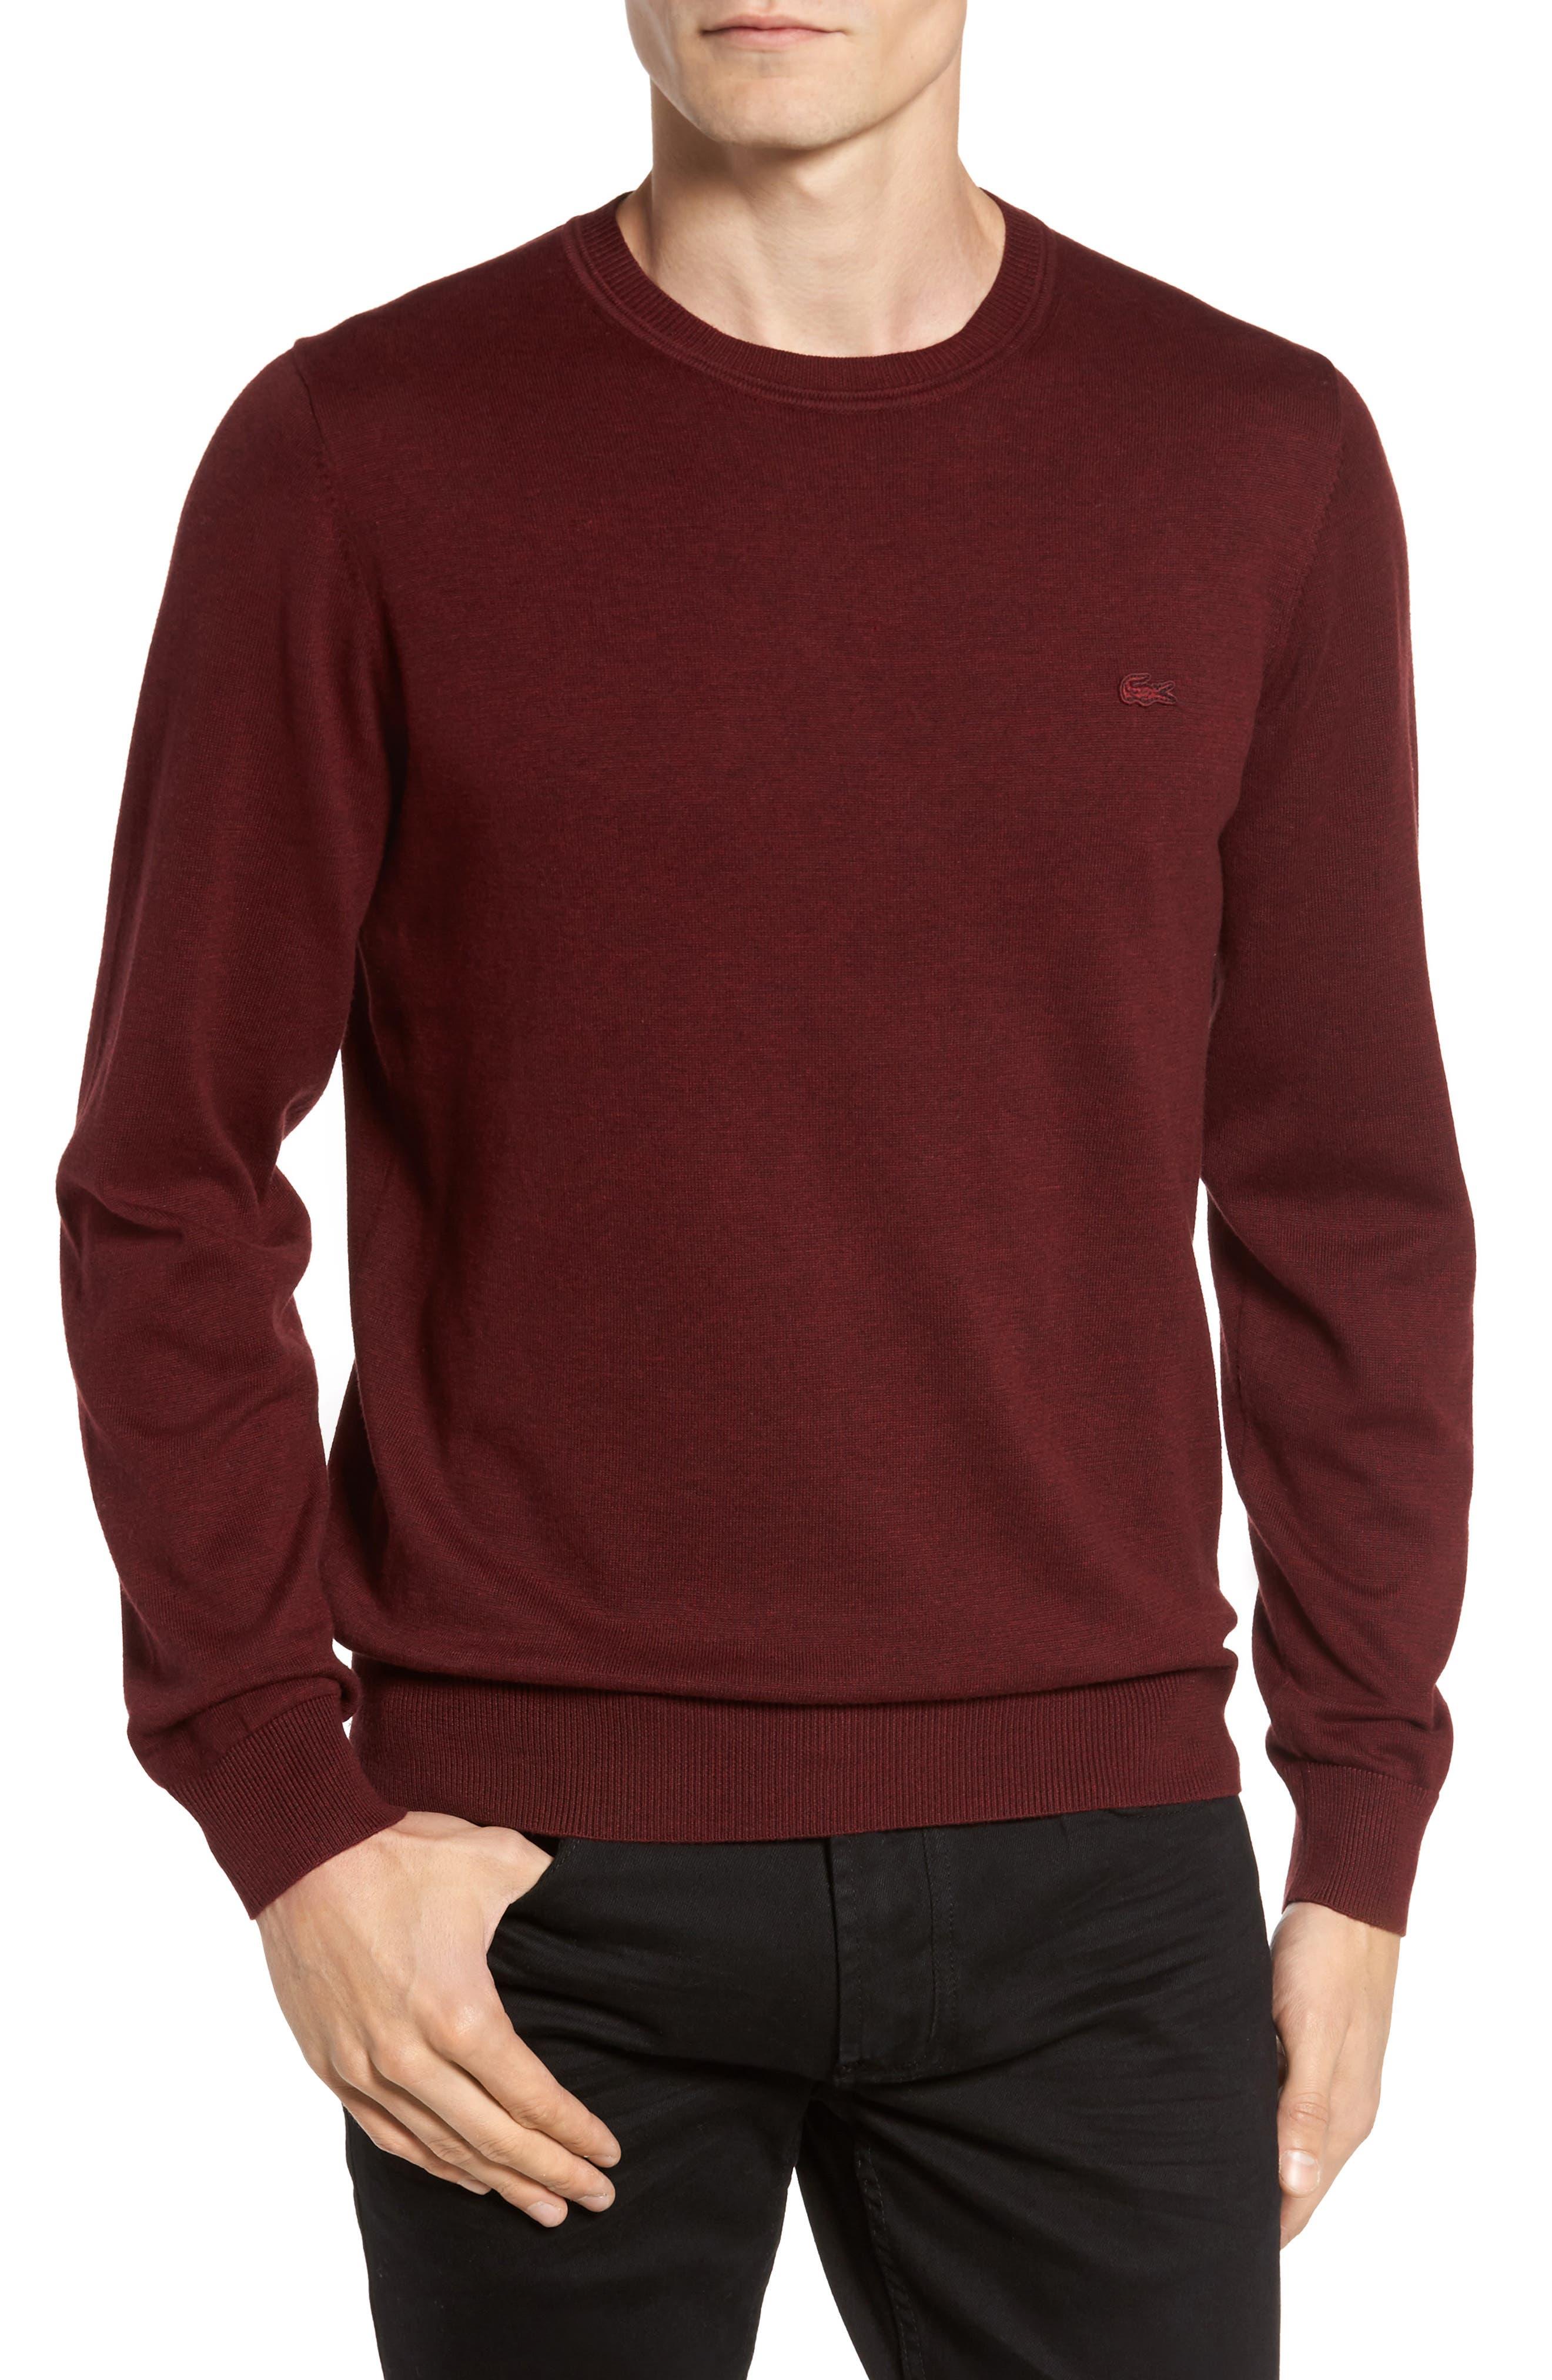 Main Image - Lacoste Jersey Knit Crewneck Sweater